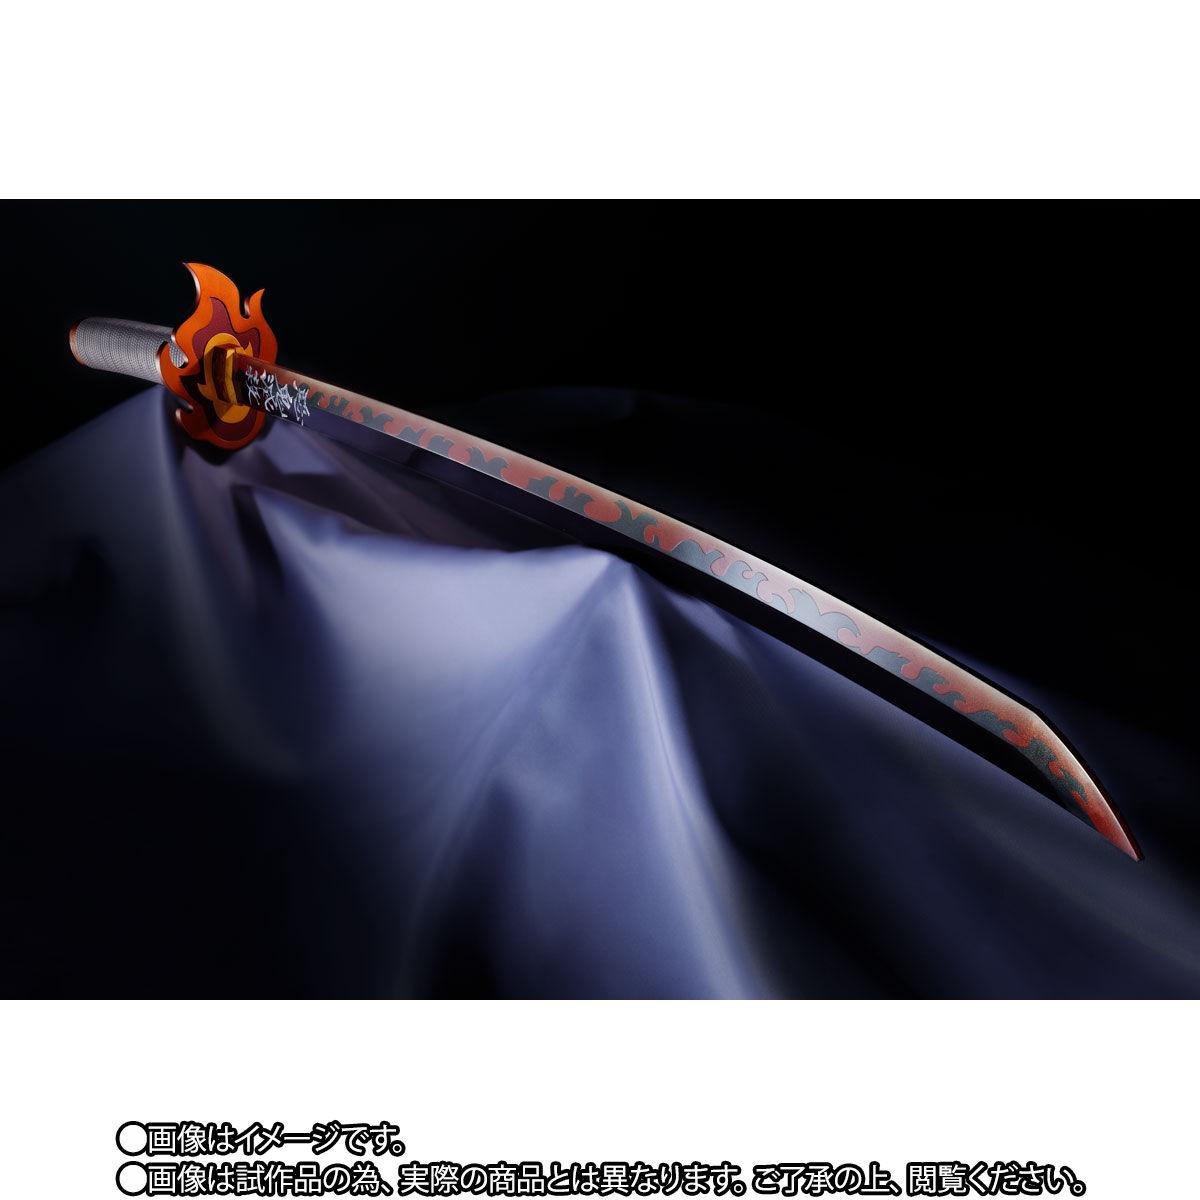 PROPLICA プロップリカ『日輪刀(煉獄杏寿郎)』鬼滅の刃 変身なりきり-007